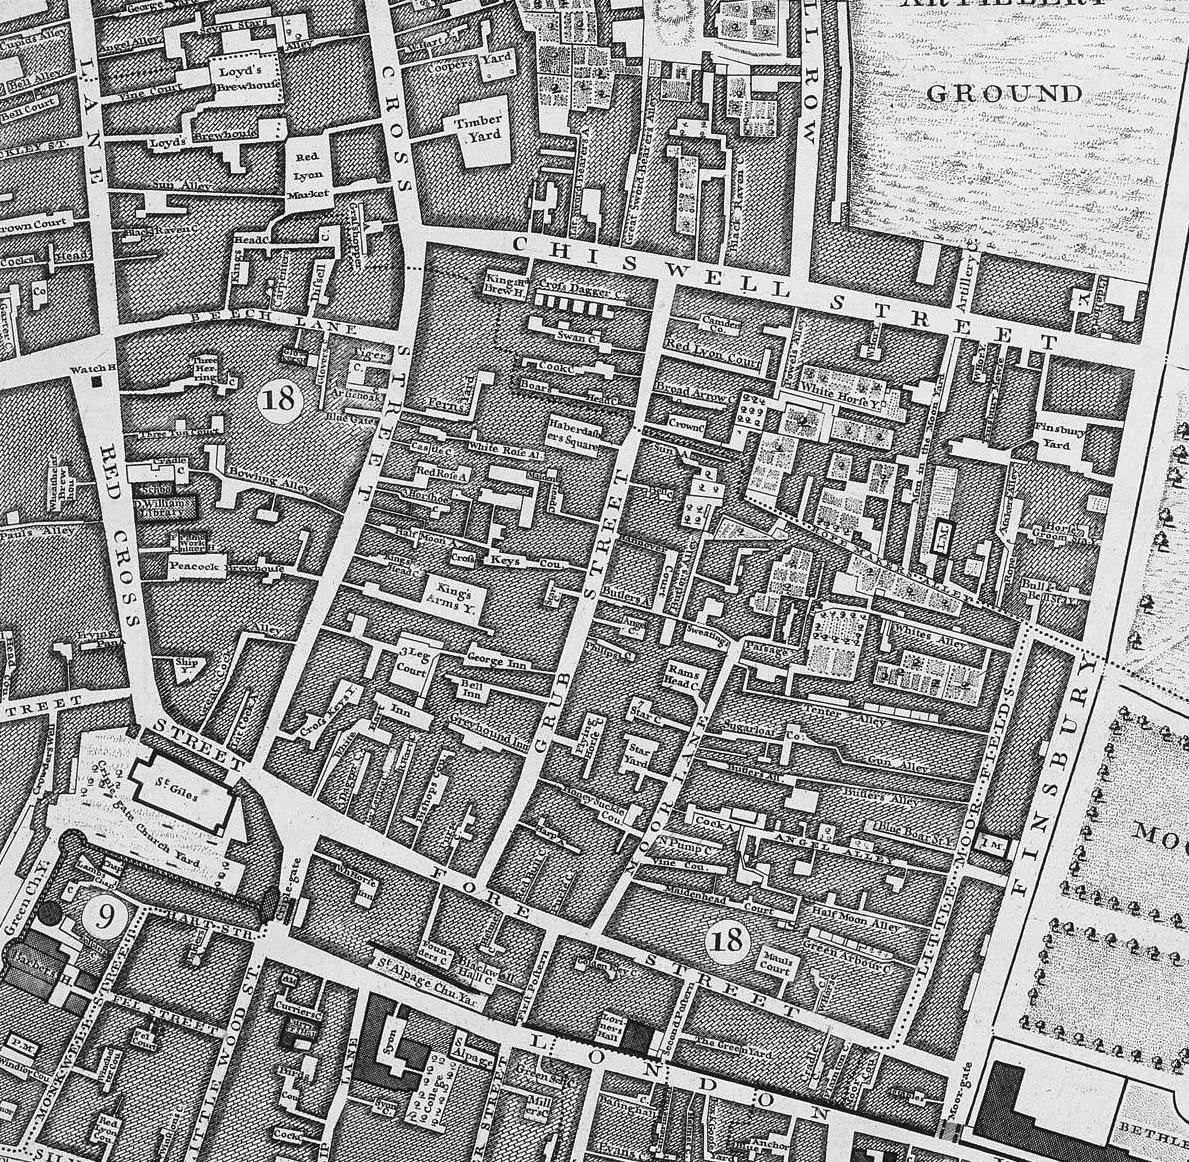 Grub street map